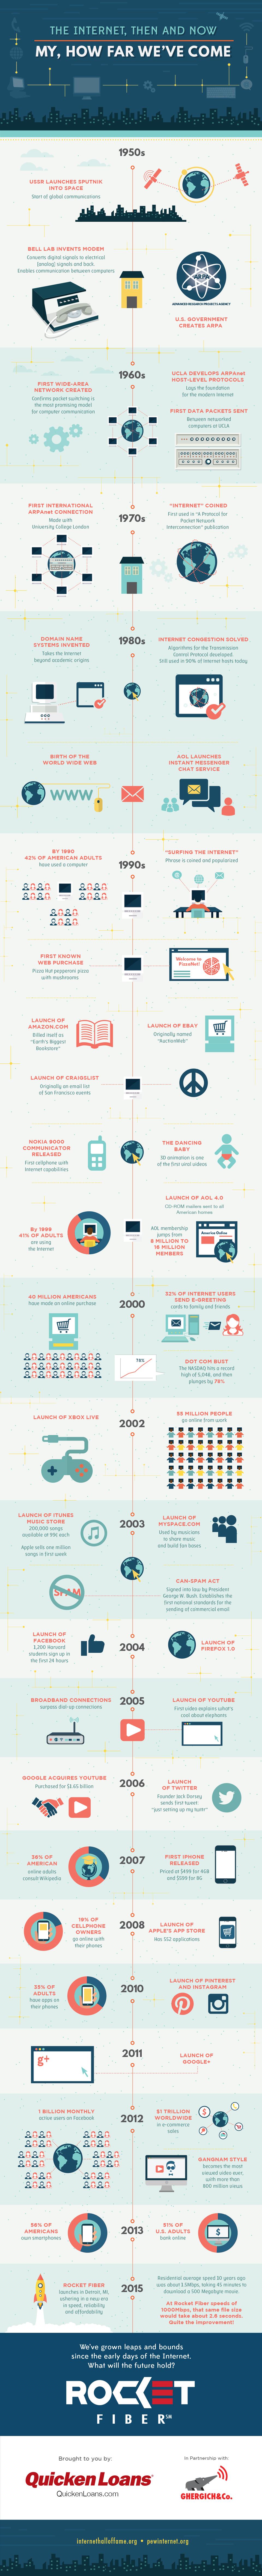 InfographicsInternet